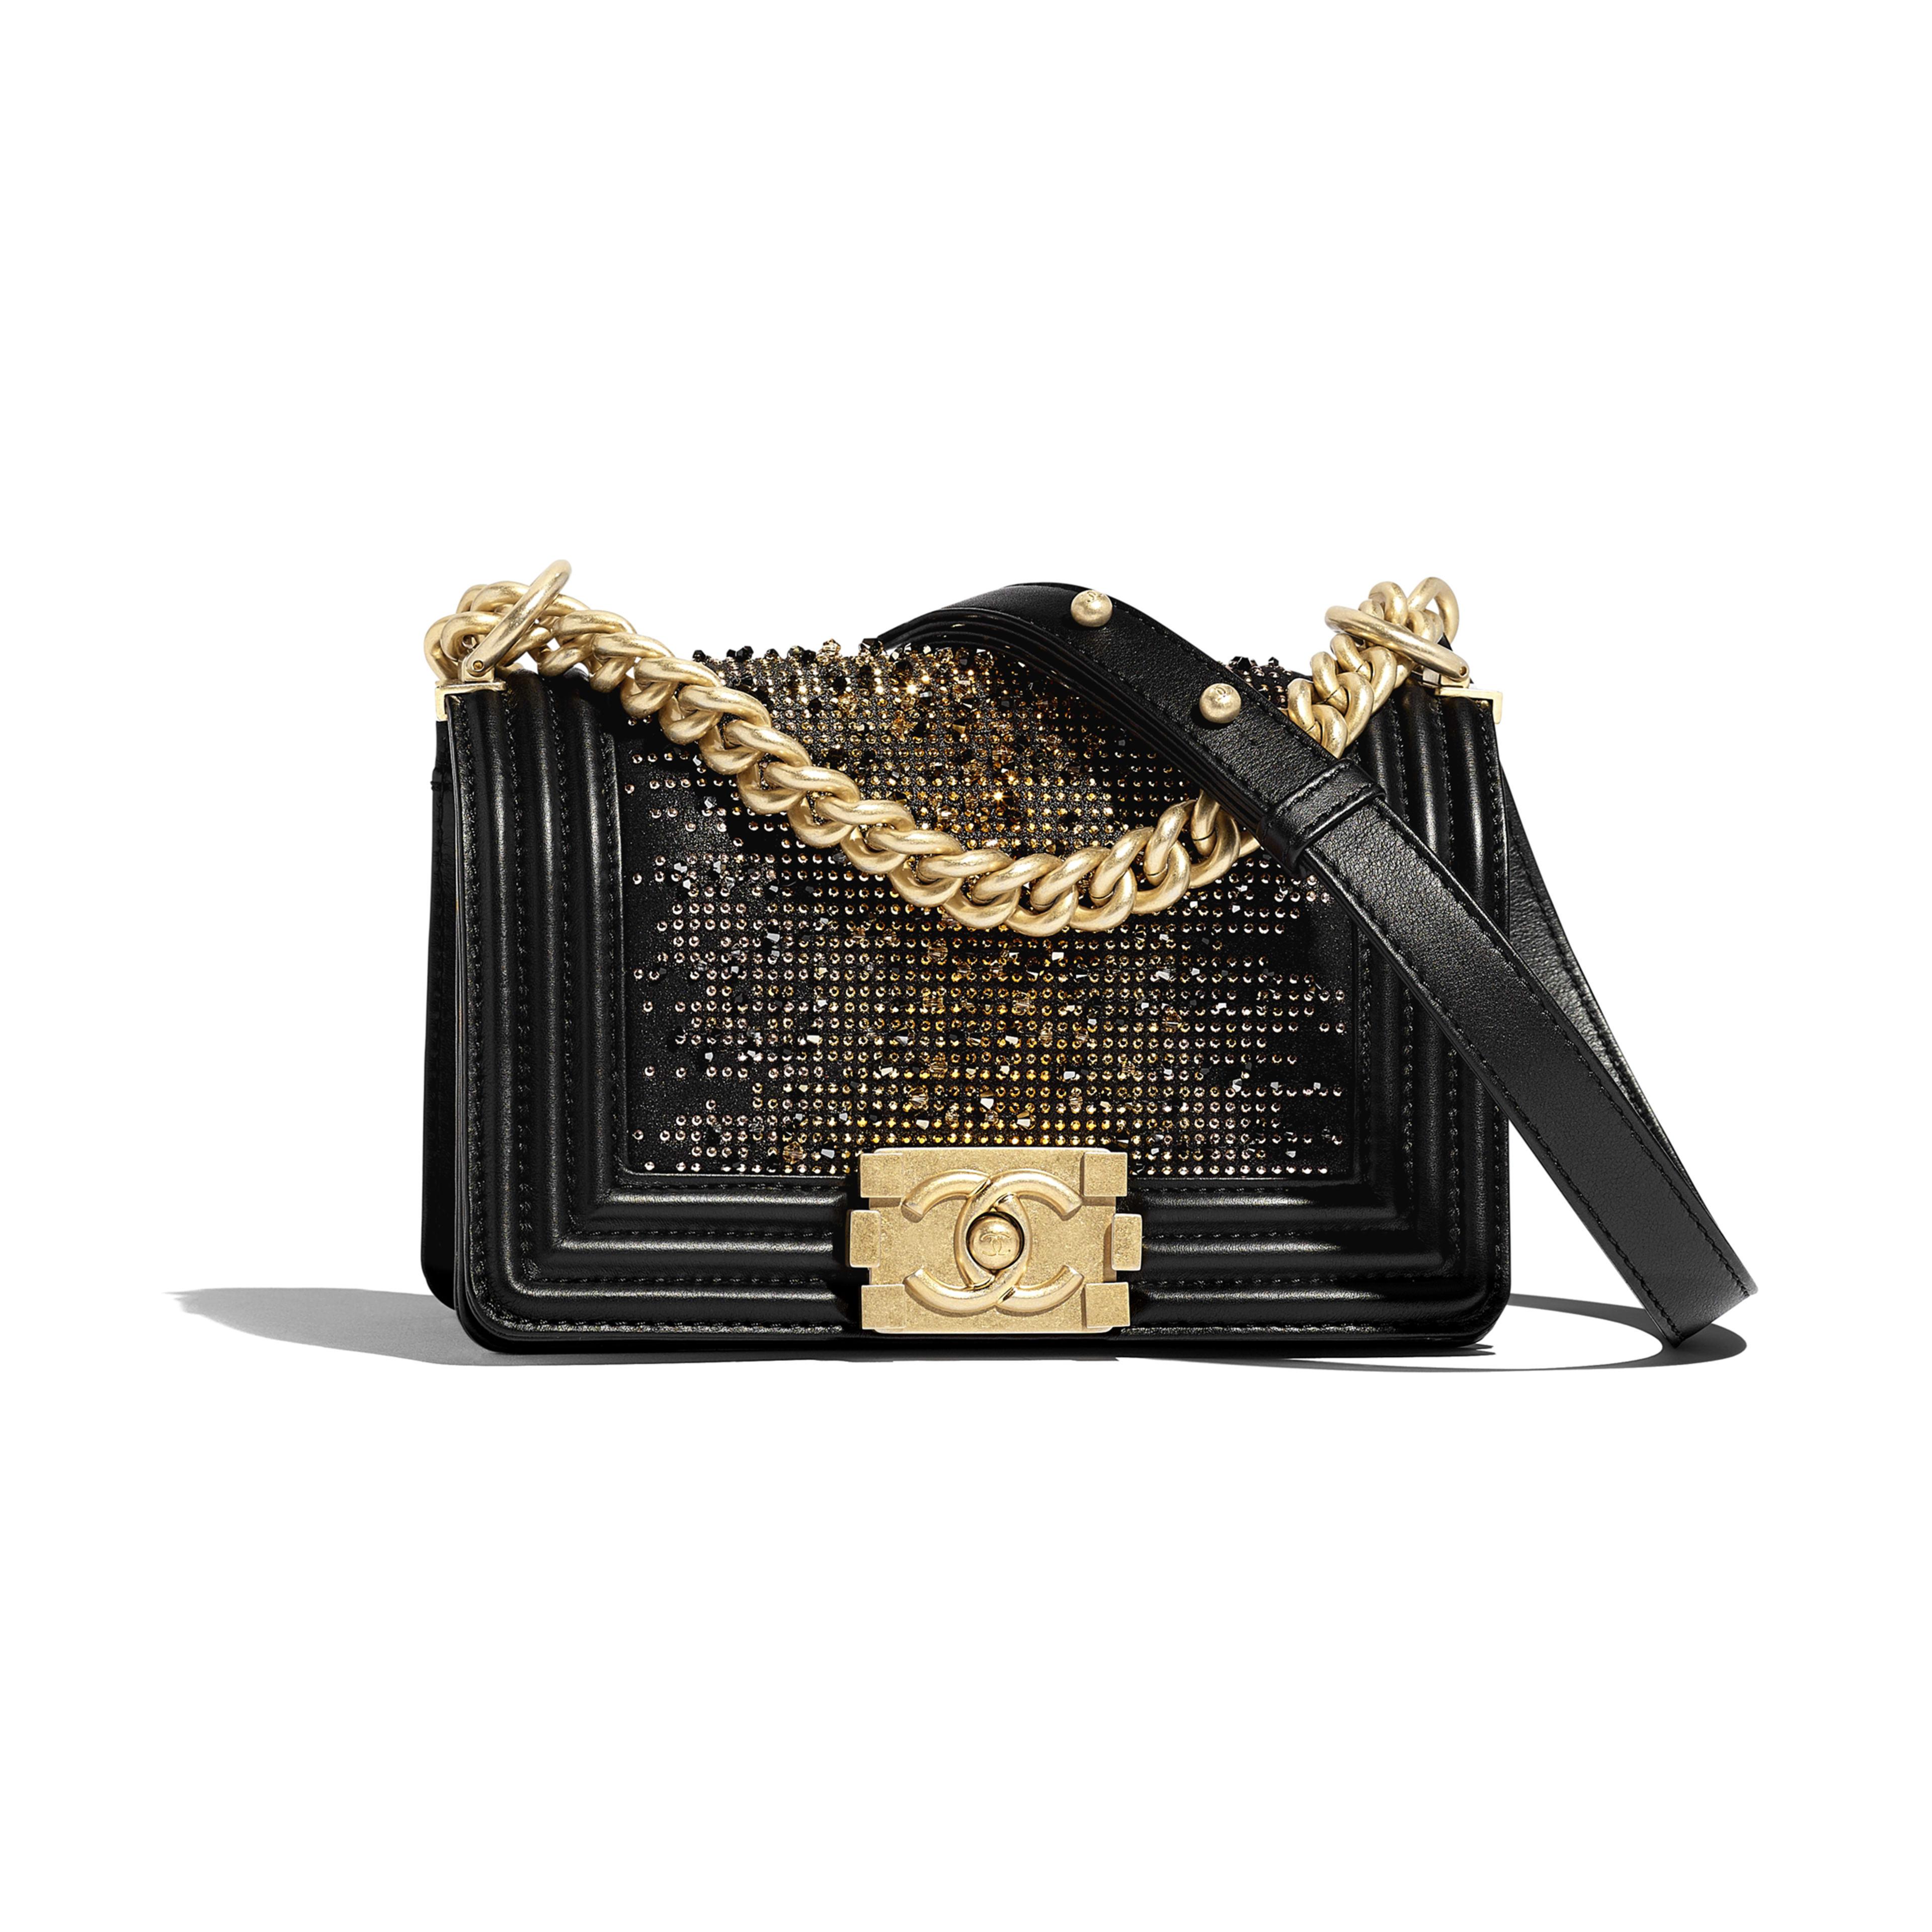 Small BOY CHANEL Handbag - Black - Calfskin, Strass & Gold-Tone Metal - Default view - see full sized version